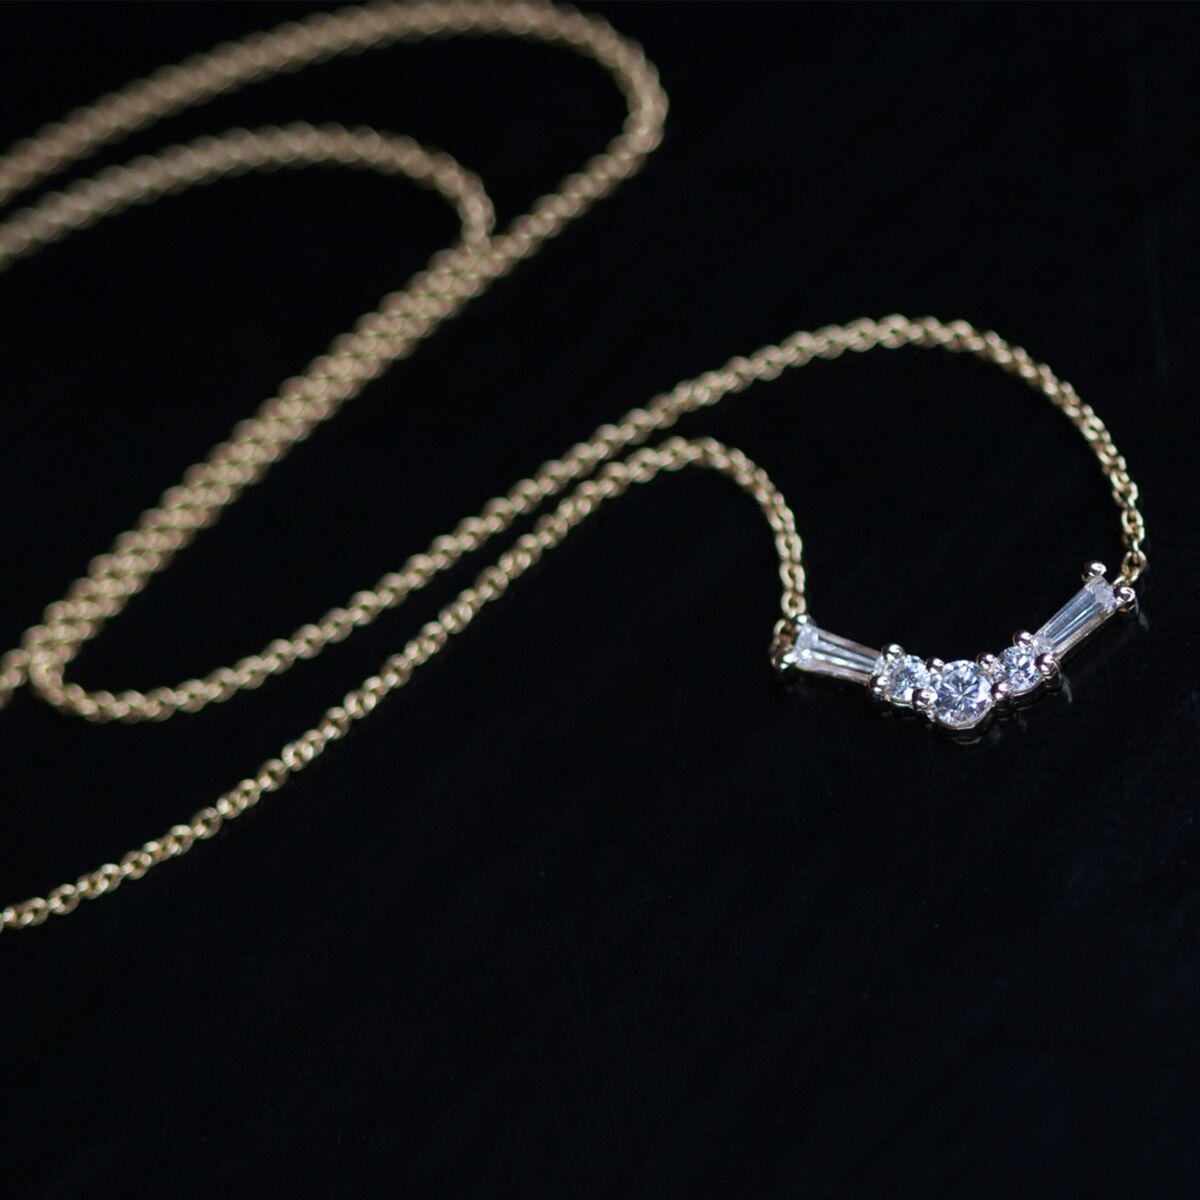 Diamond Constellation Necklace image